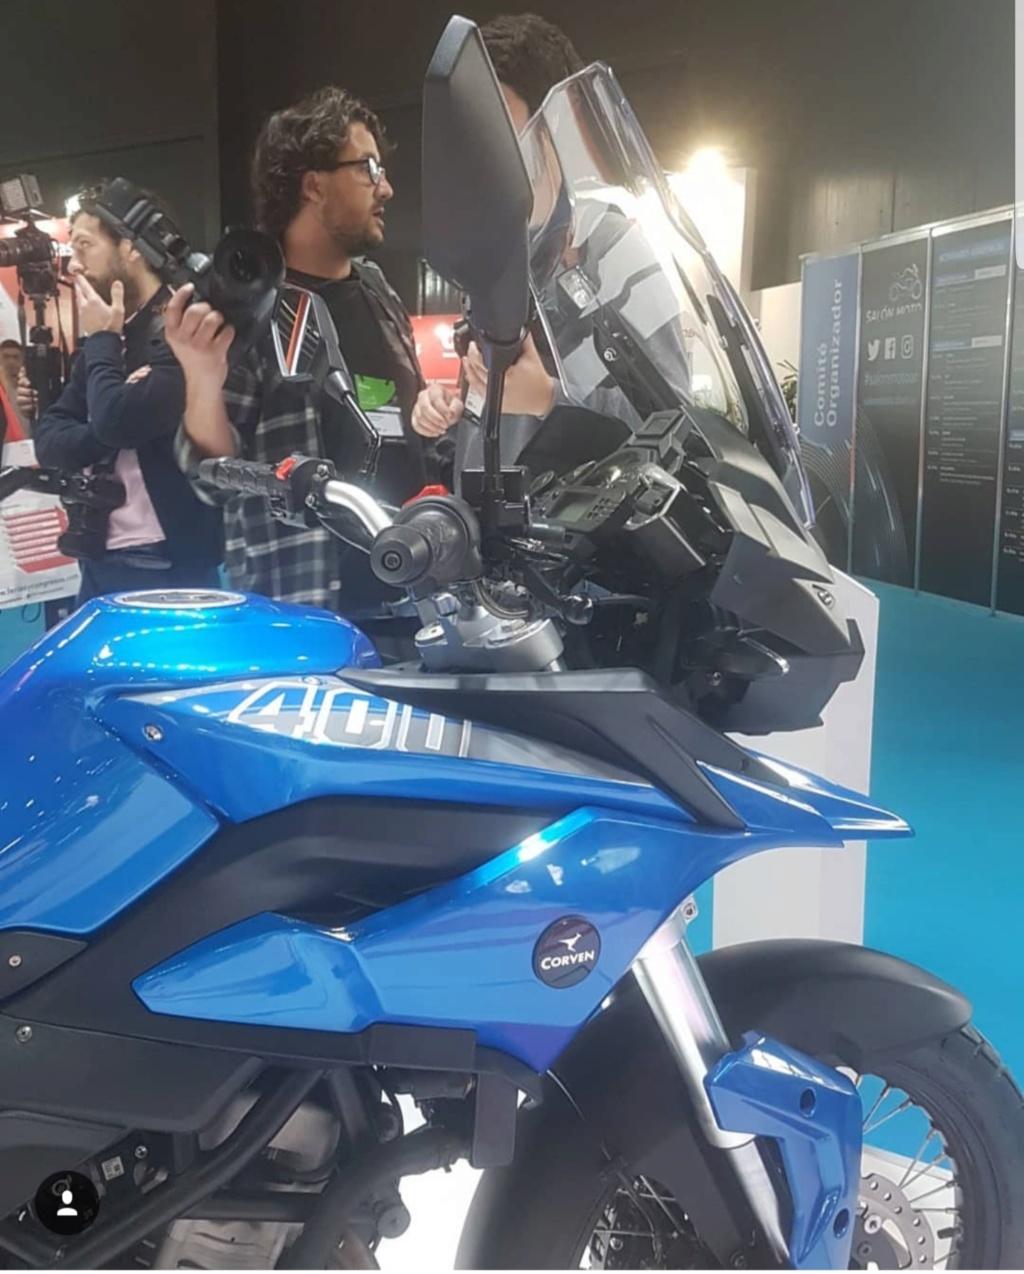 SALON INTERNACIONAL DE LA MOTOCICLETA ARGENTINA 20181012